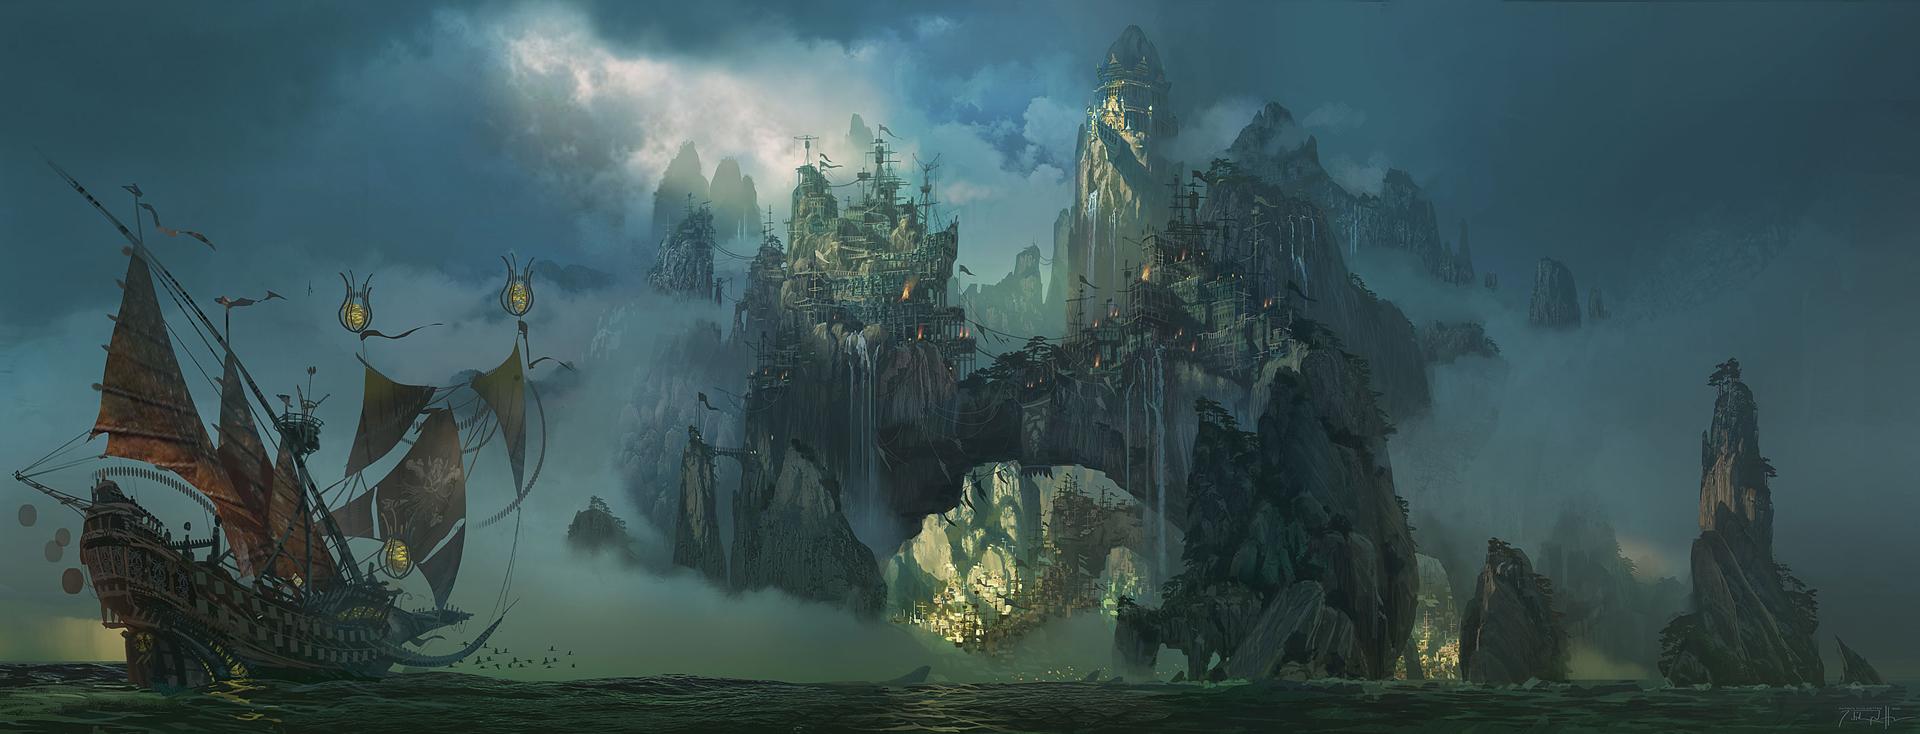 Bilgewater - Regions - Universe of League of Legends